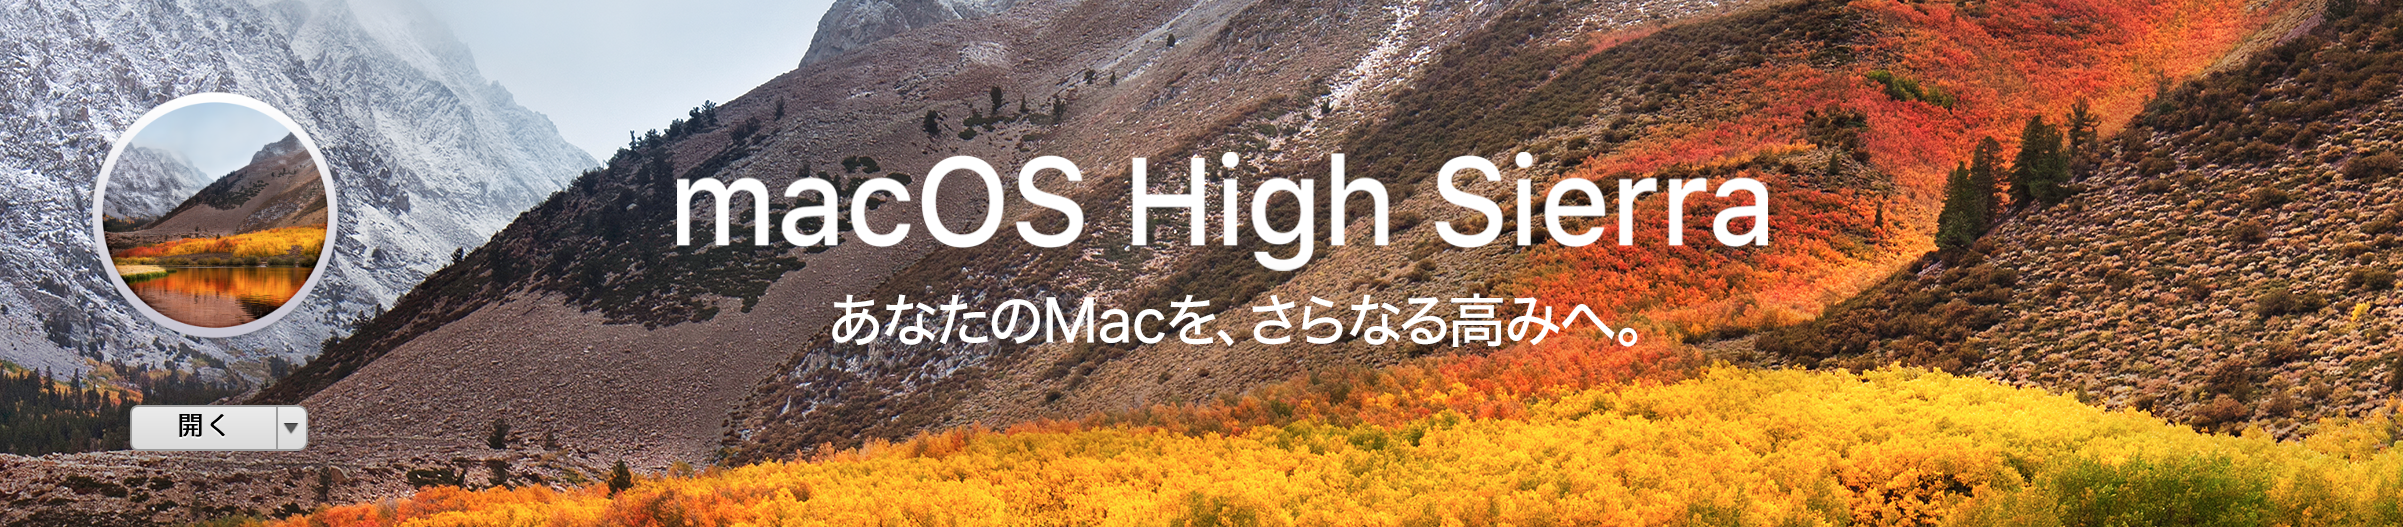 release-macos-hgh-sierra